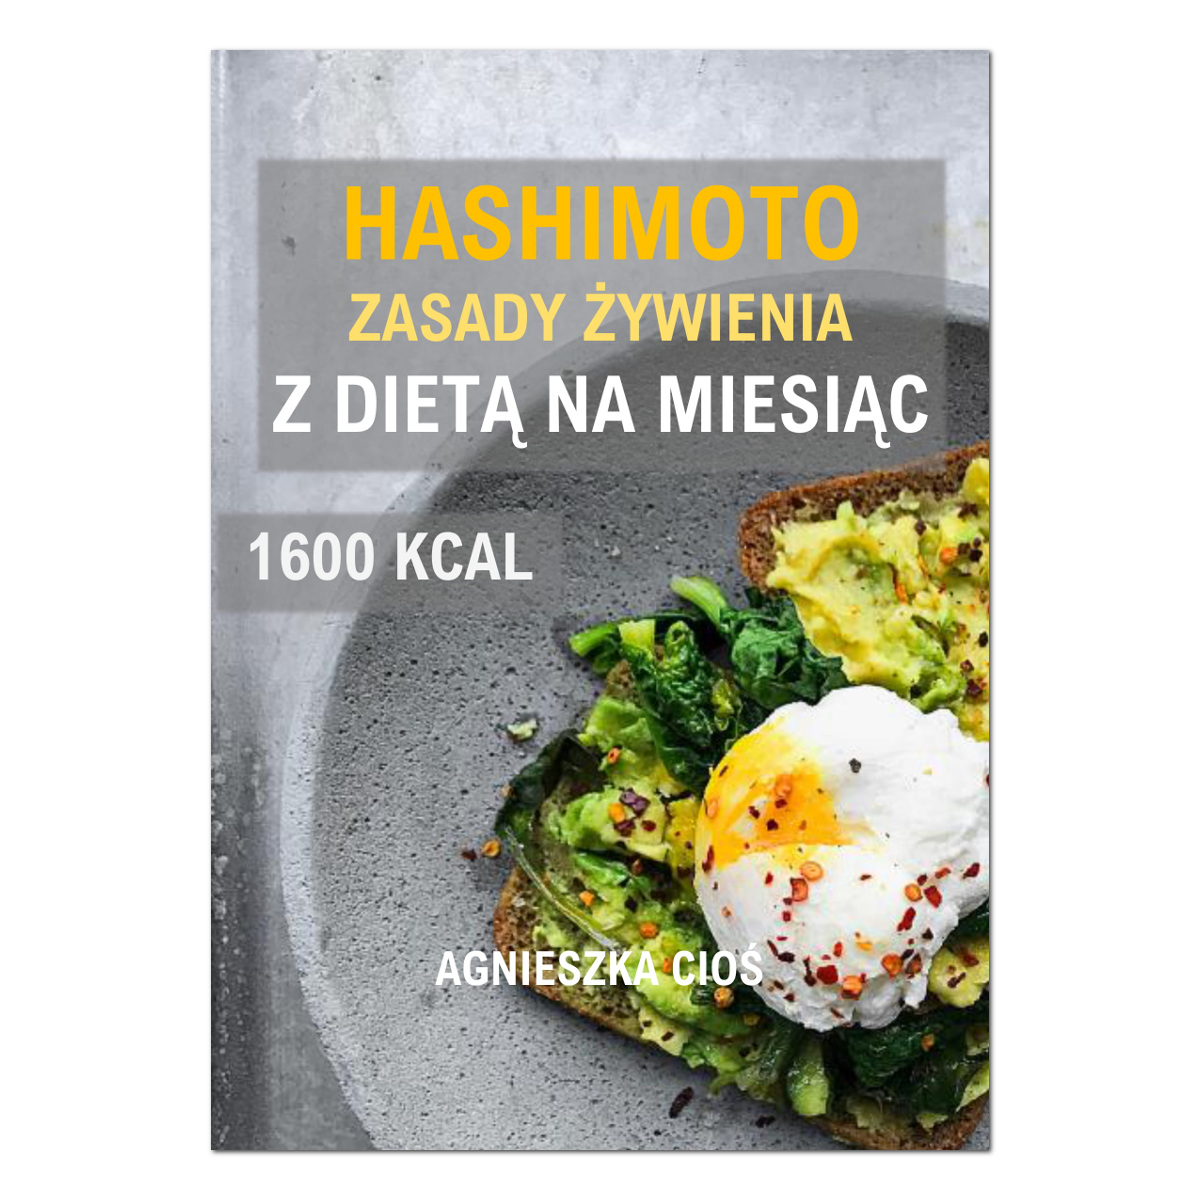 Hashimoto - ebook